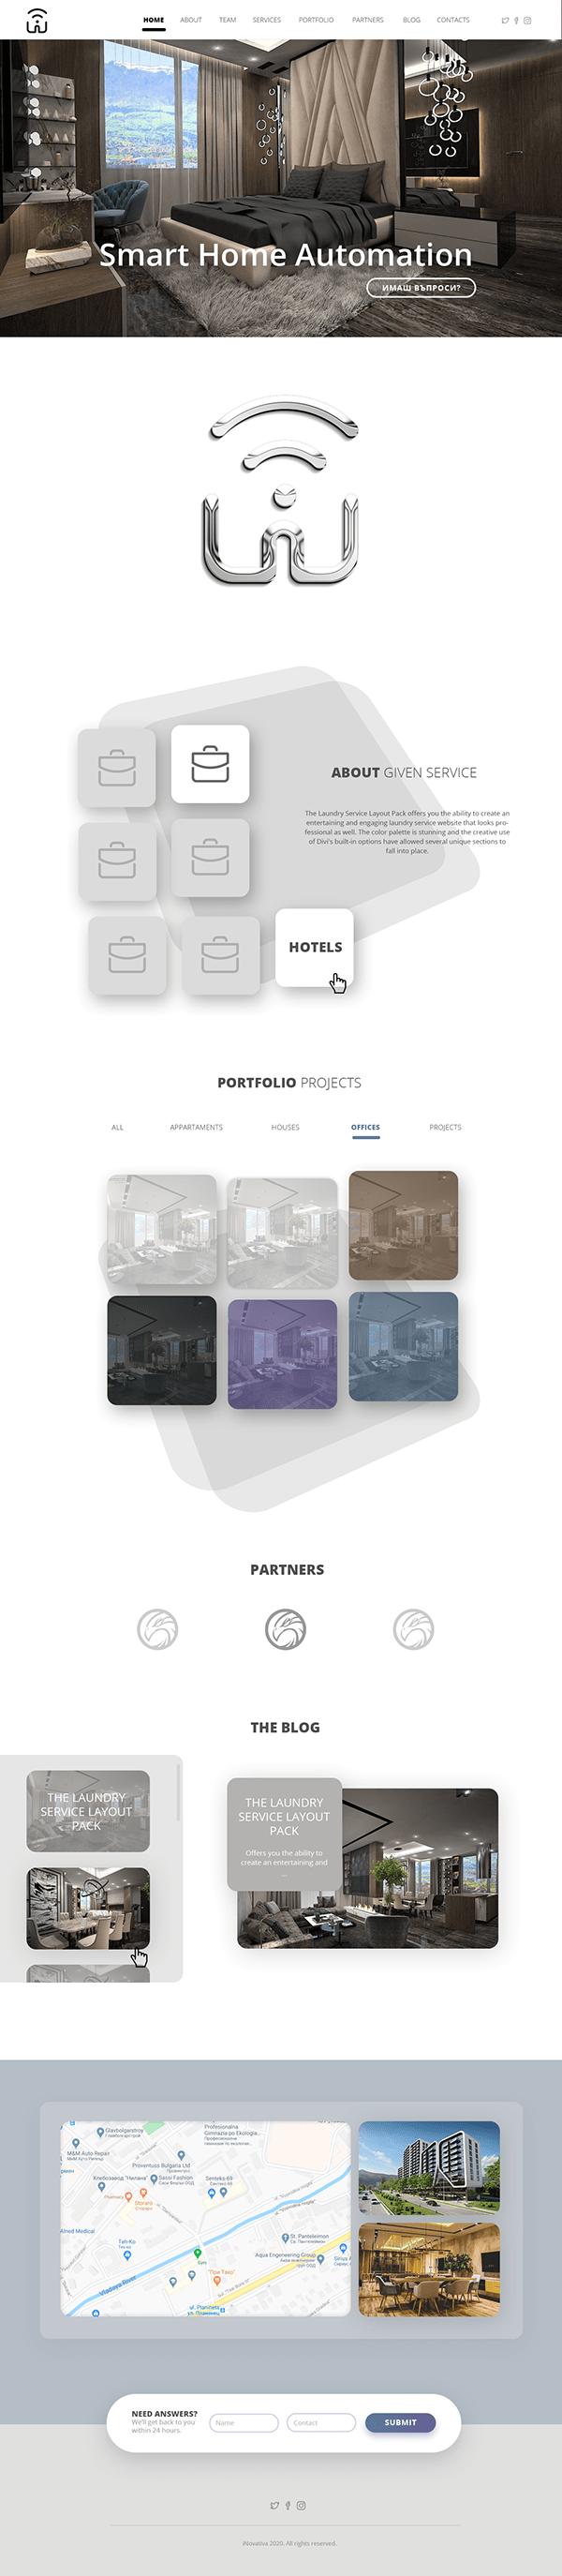 Home Automation Website Design